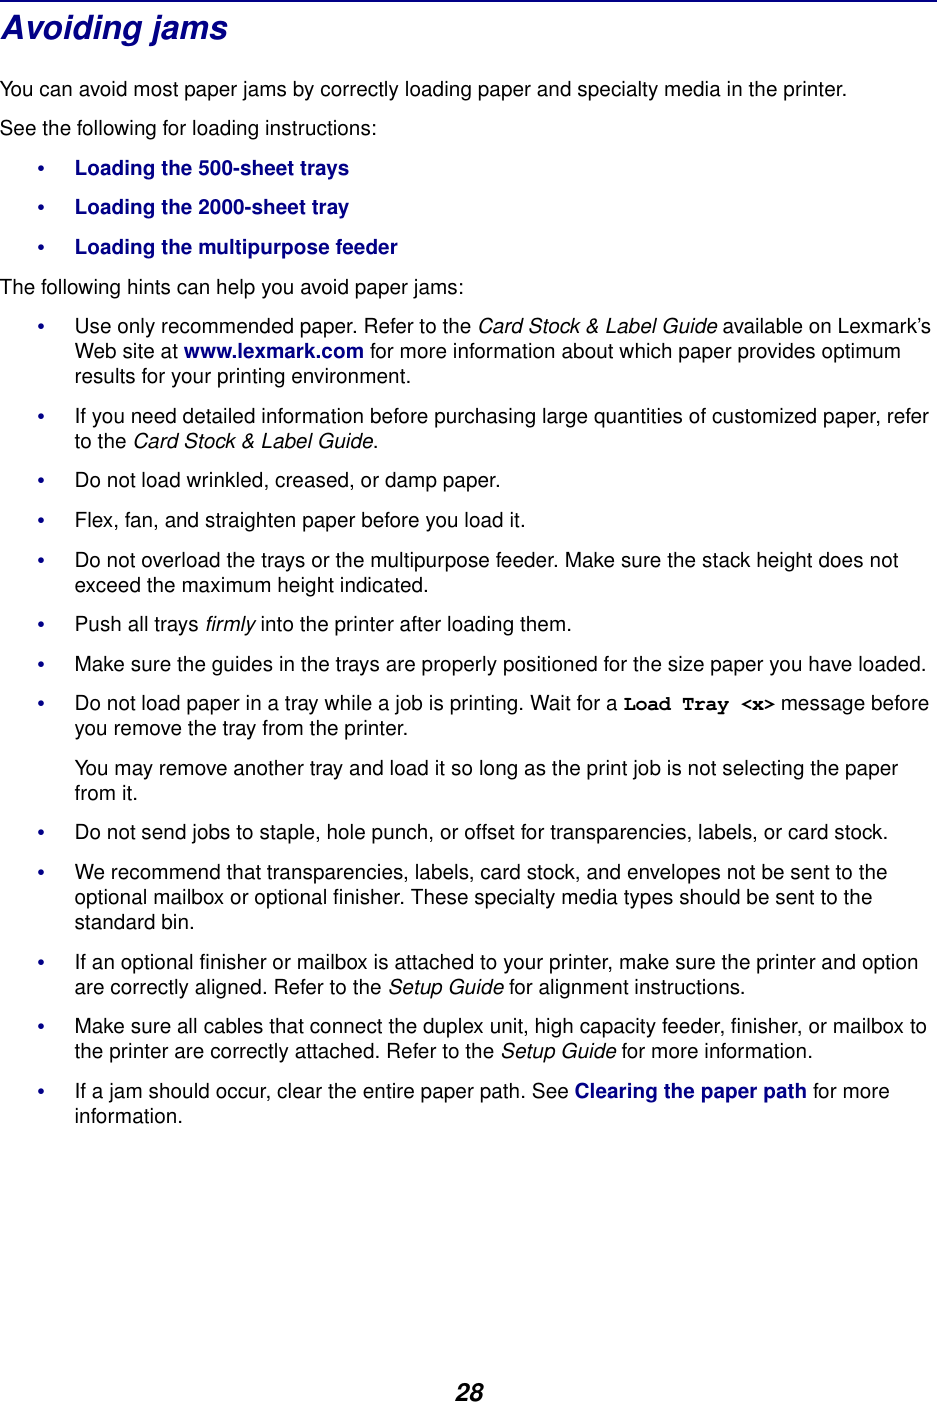 Lexmark C750 Owner S Manual User's Guide